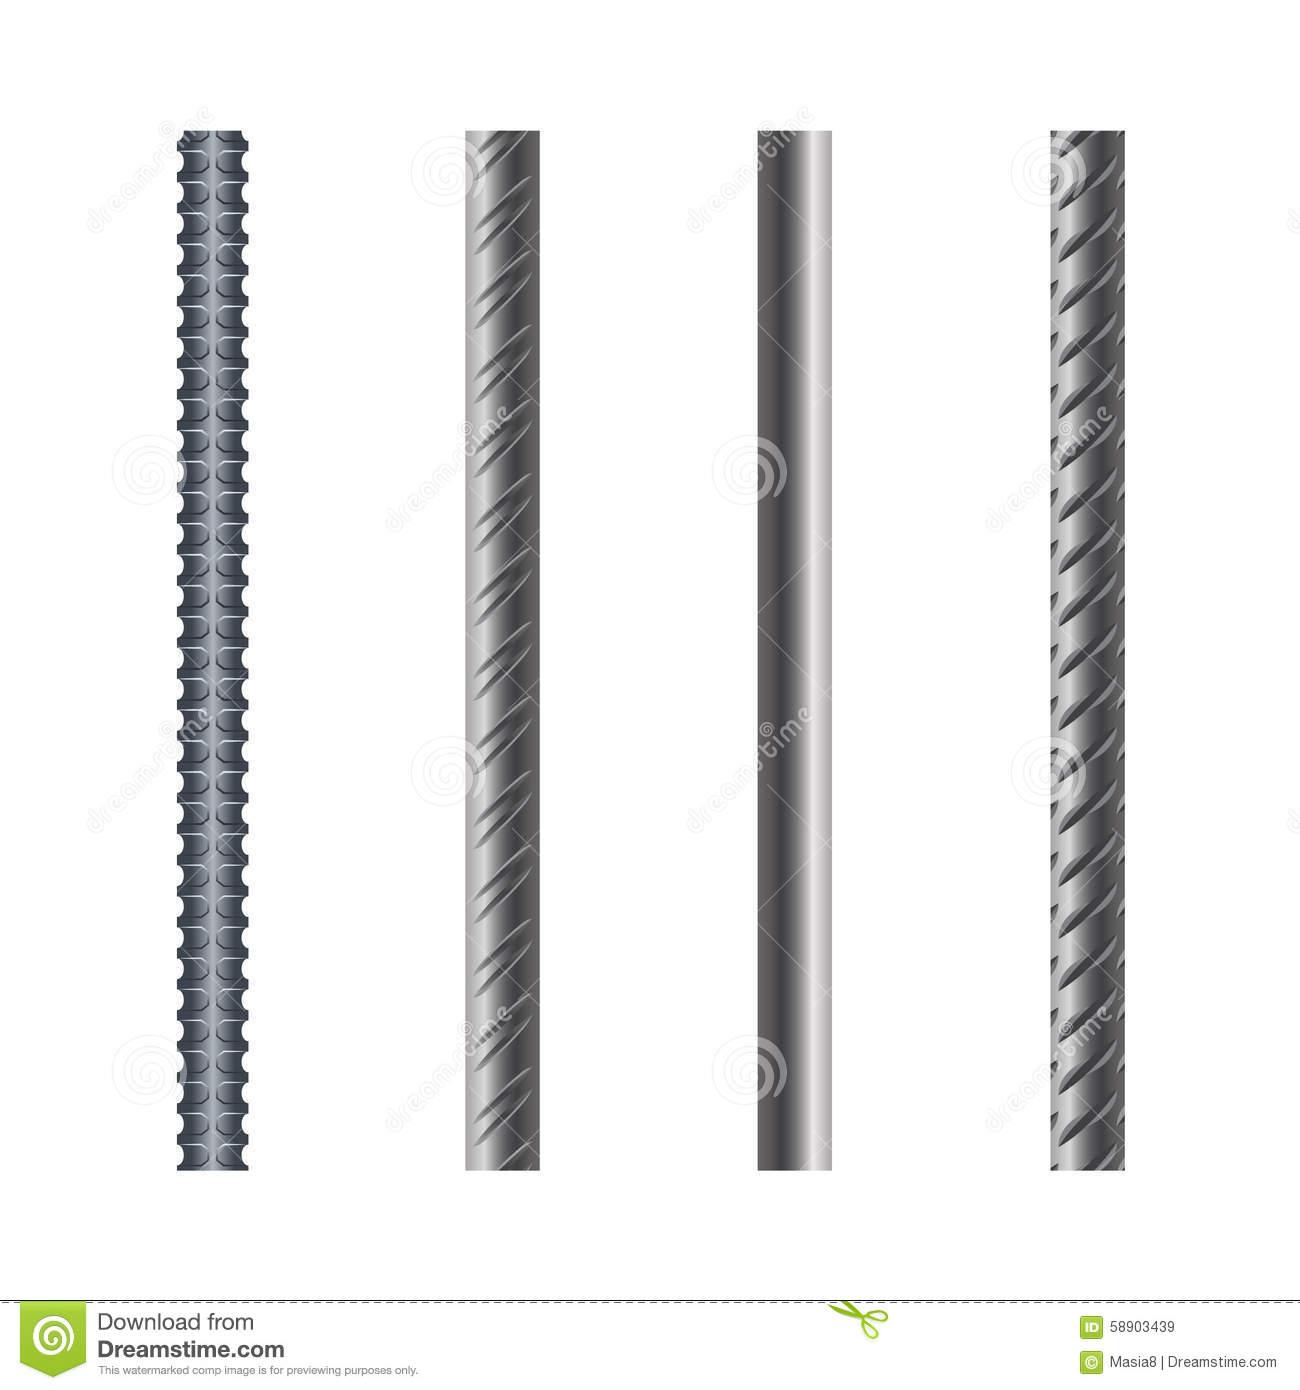 Endless Rebars, Reinforcement Steel, Illustration Stock.